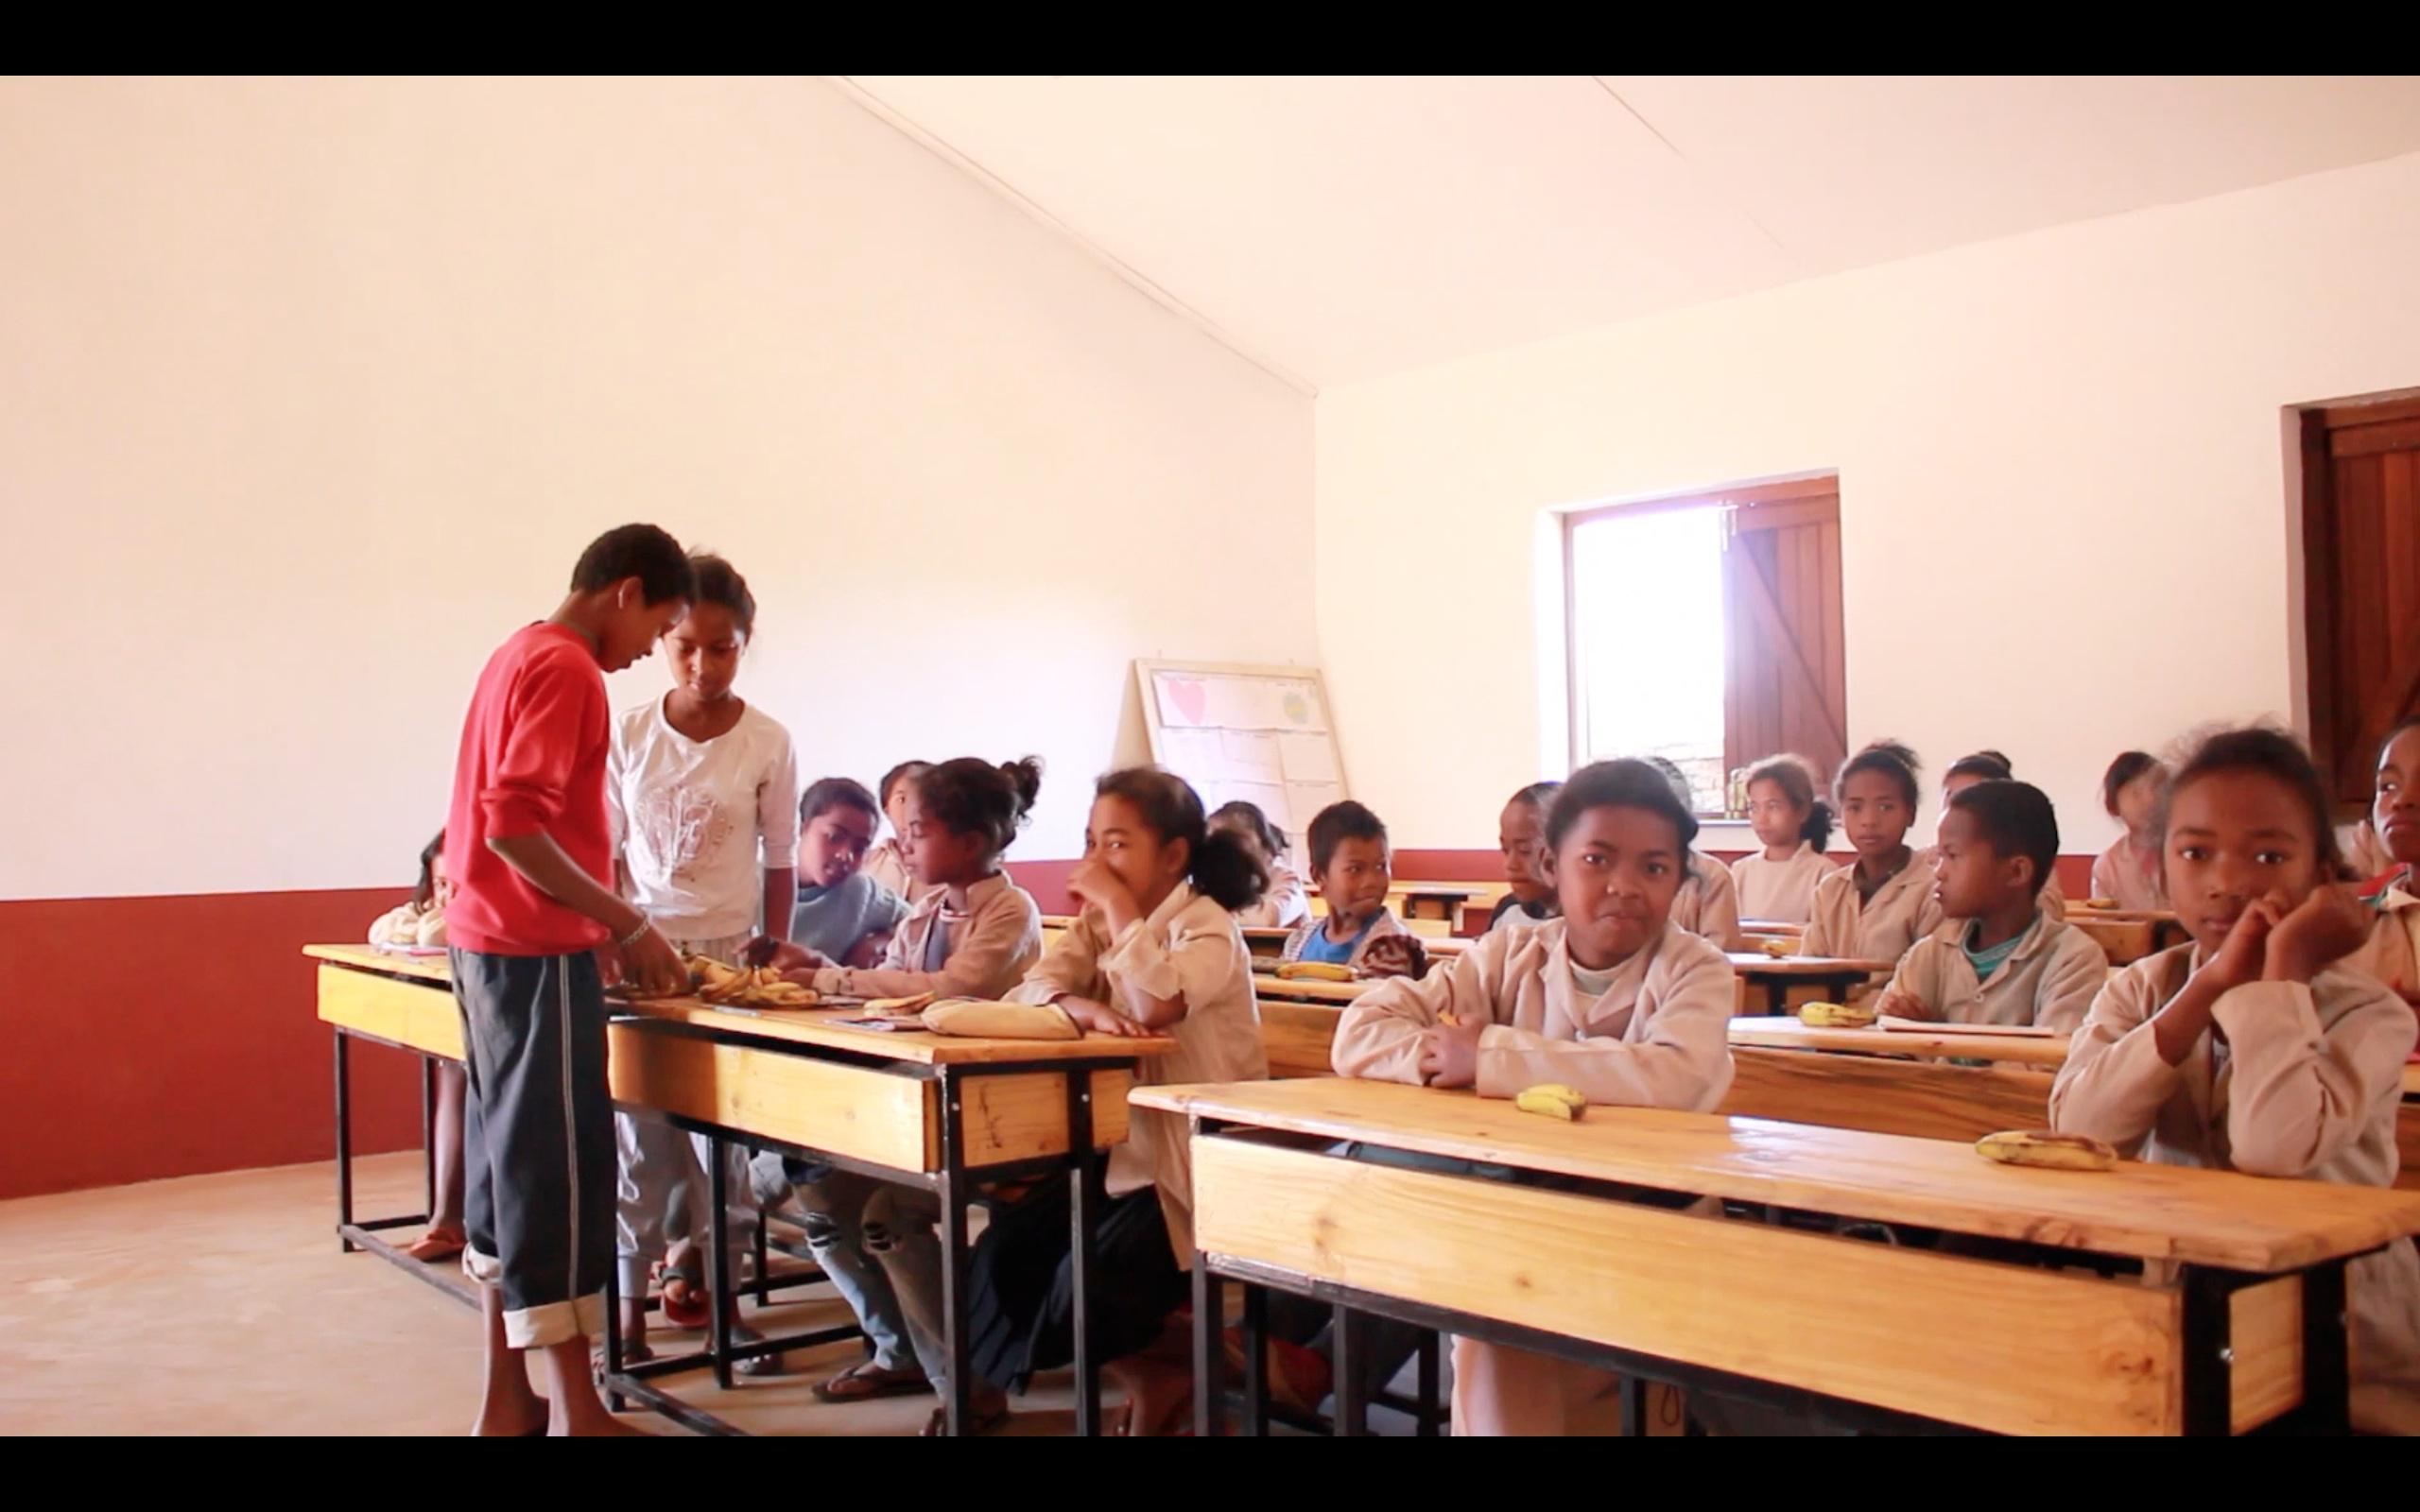 mr-bricolage-humanitaire-grandir-ailleurs-ecole-antsirabe-madagascar